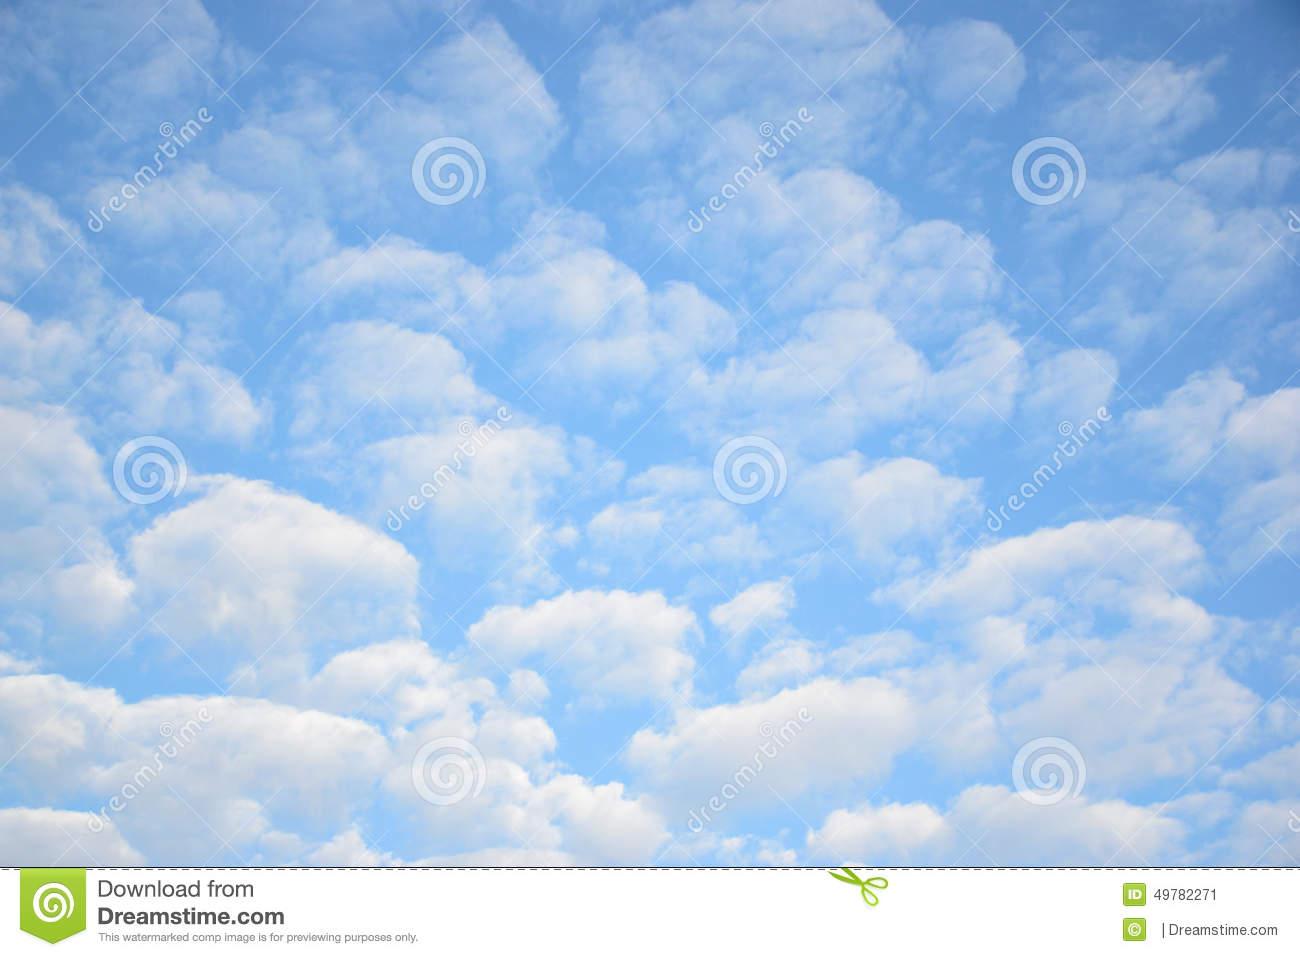 Altocumulus Clouds In Blue Sky Stock Photo.